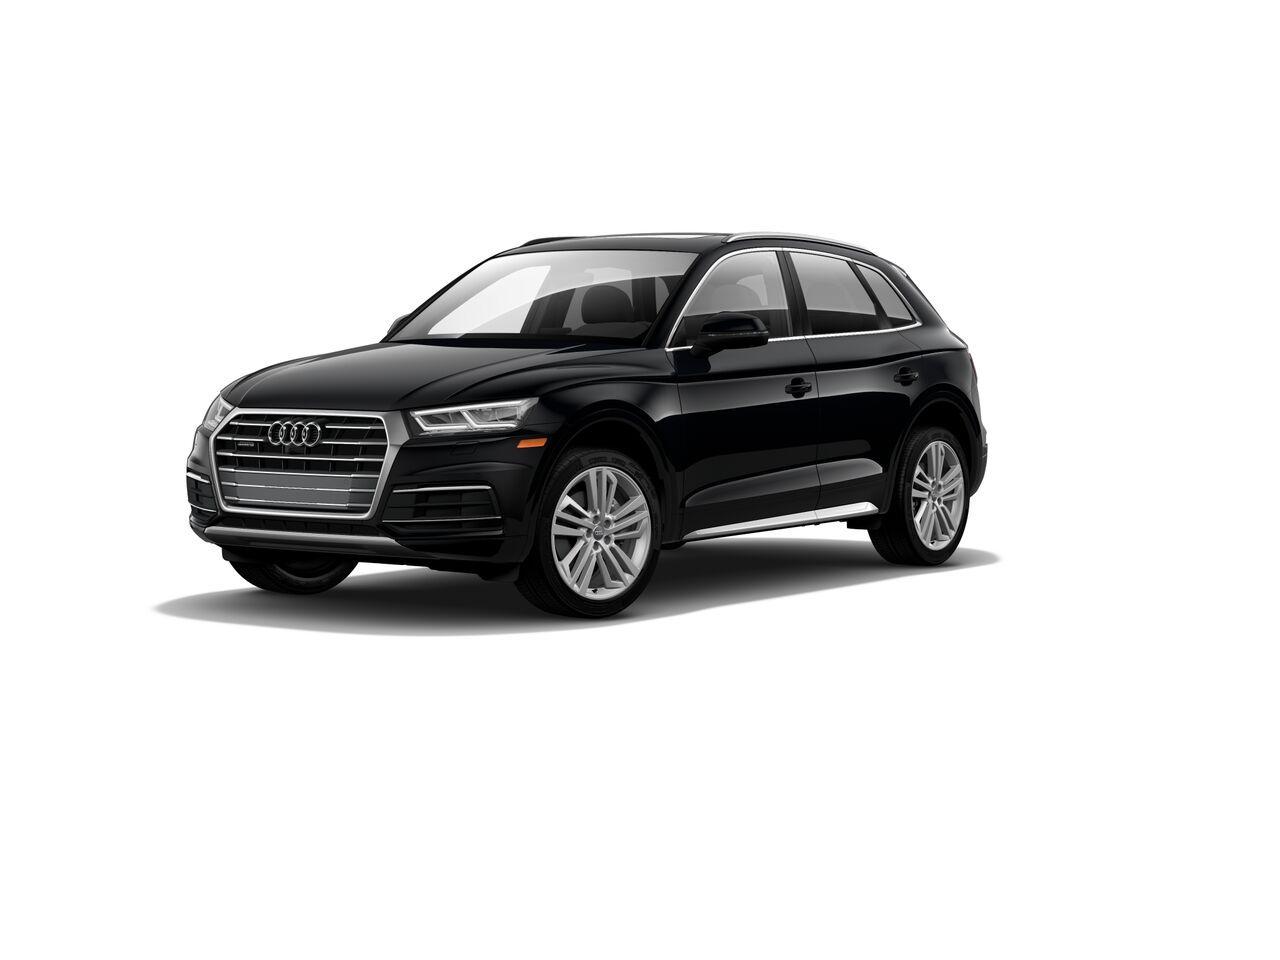 Build Your Own Custom Audi Q5 Audi Usa Audi Usa Audi Audi Q5